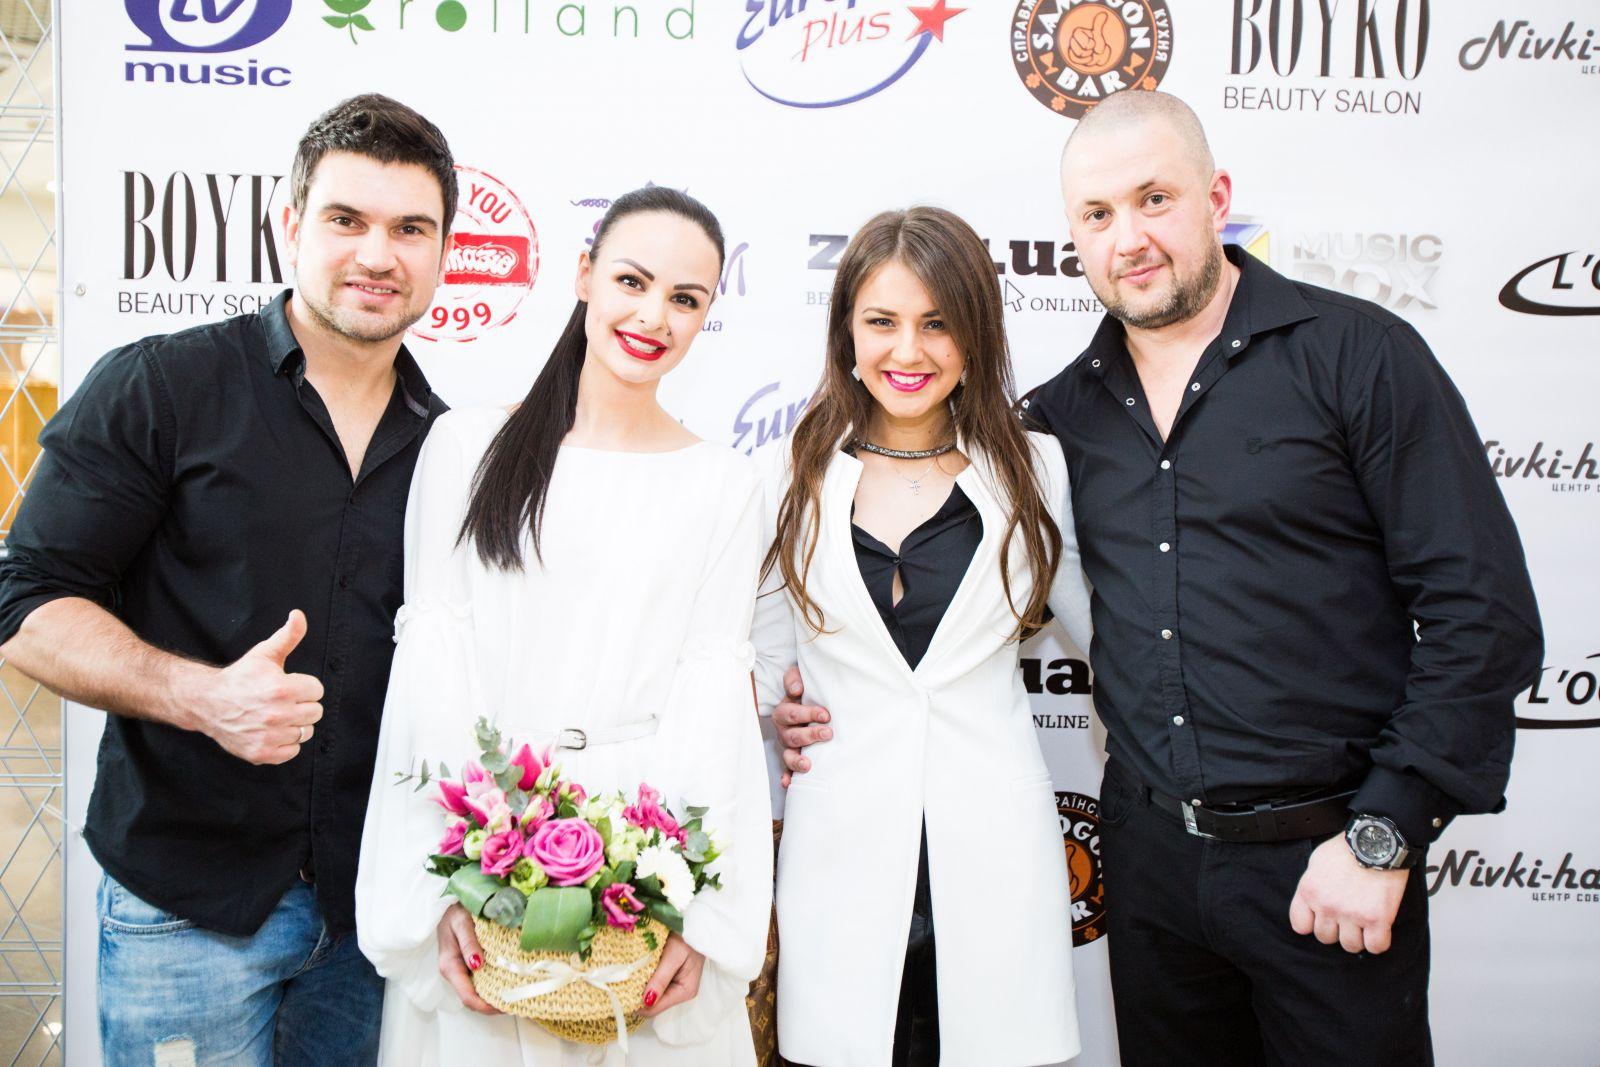 Василий Бондарчук и Катя Веласкес в Boyko Beauty Salon